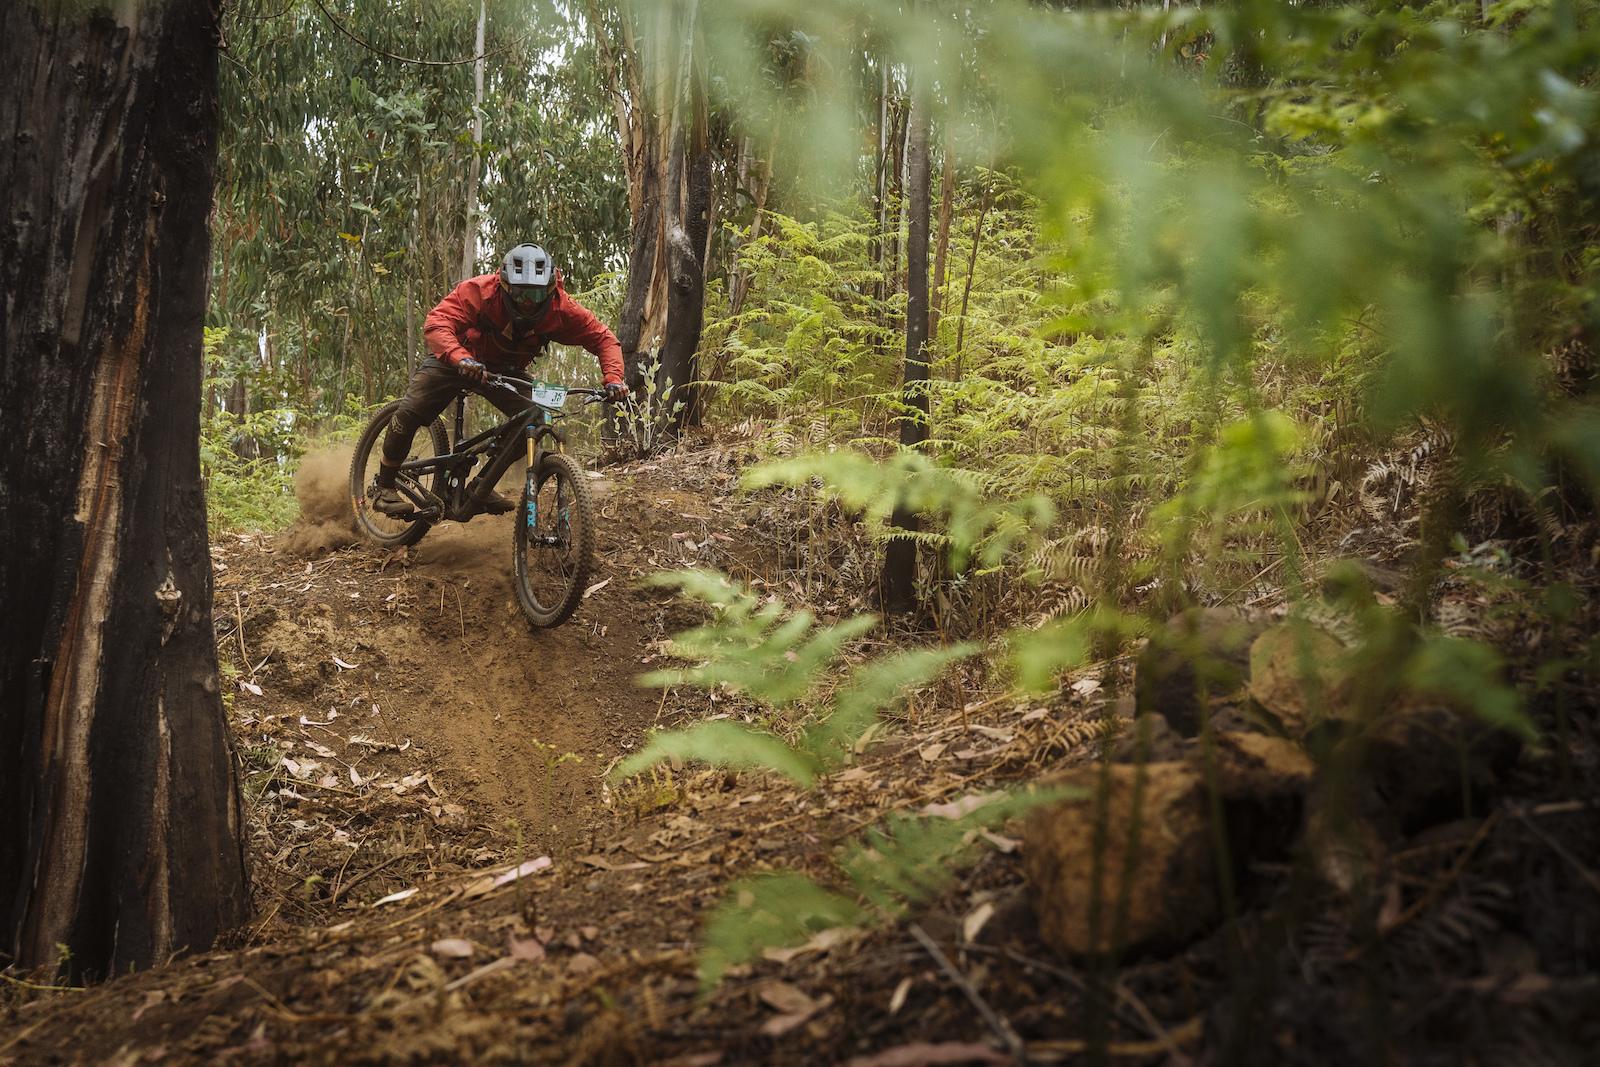 Fresh cut dusty sections encouraged wild riding.